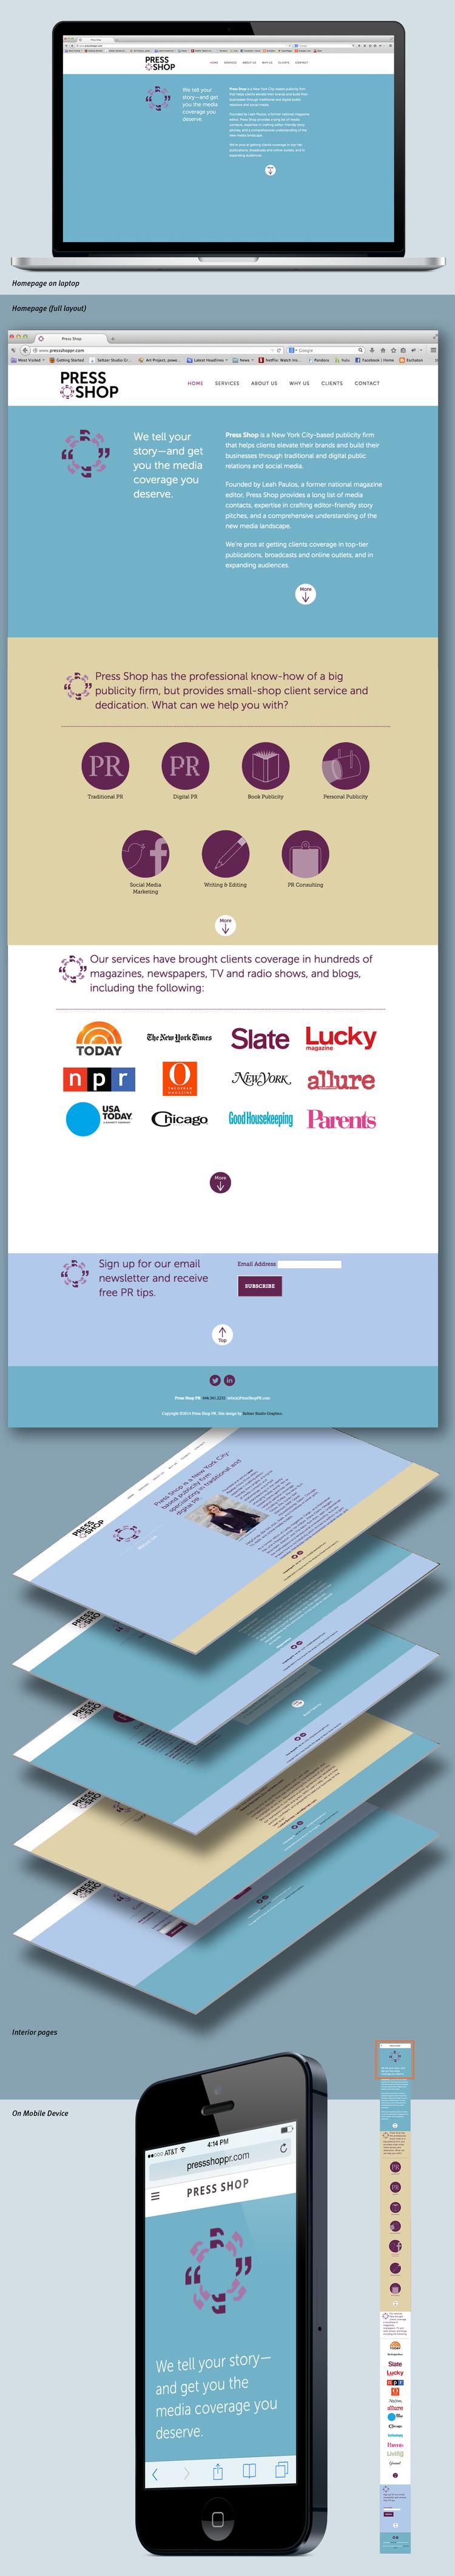 Press Shop homepage